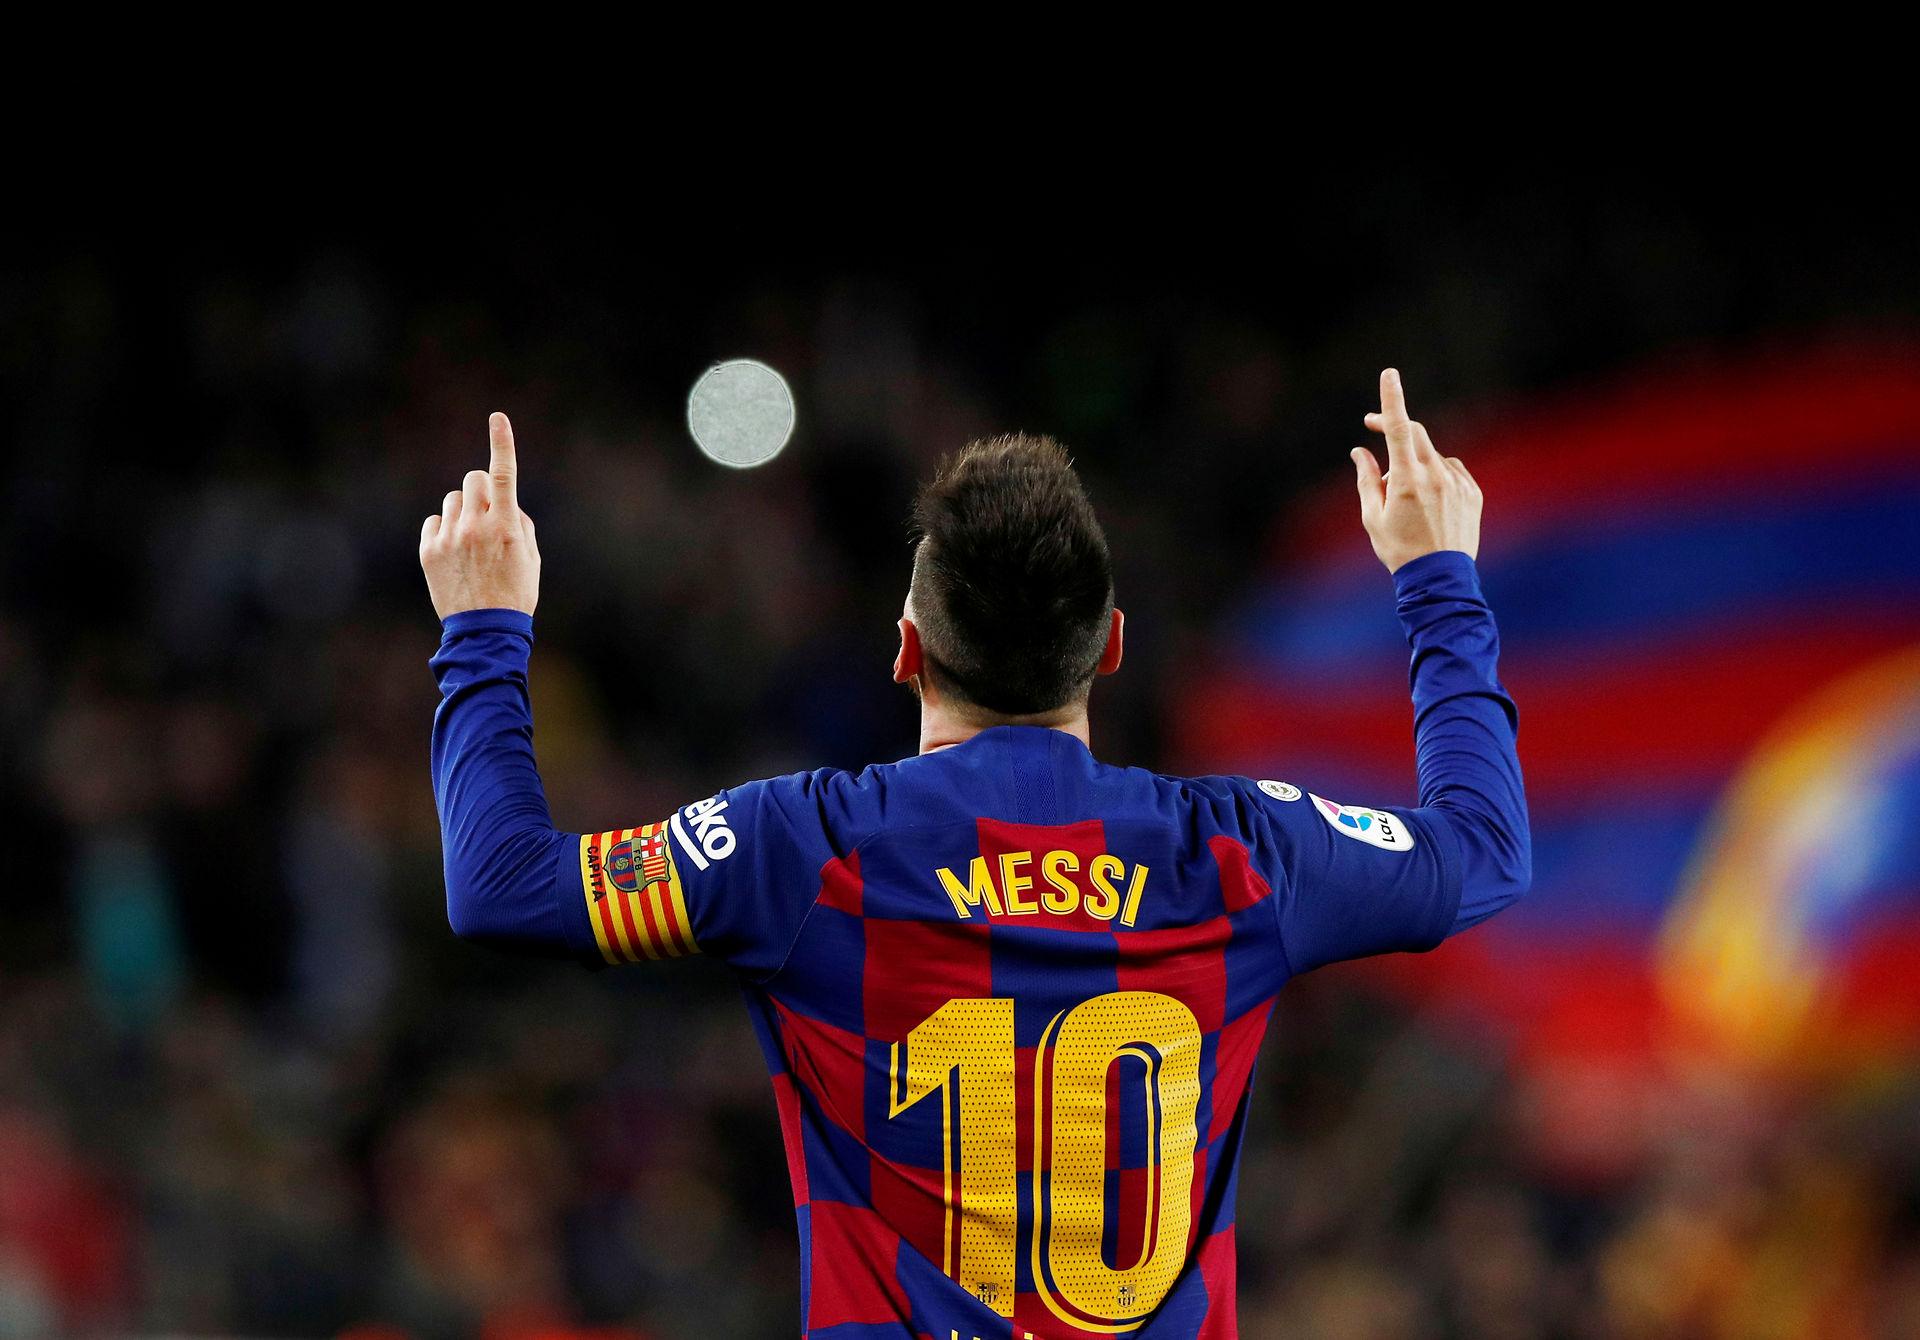 Top 50: De bedste spillere i Europa